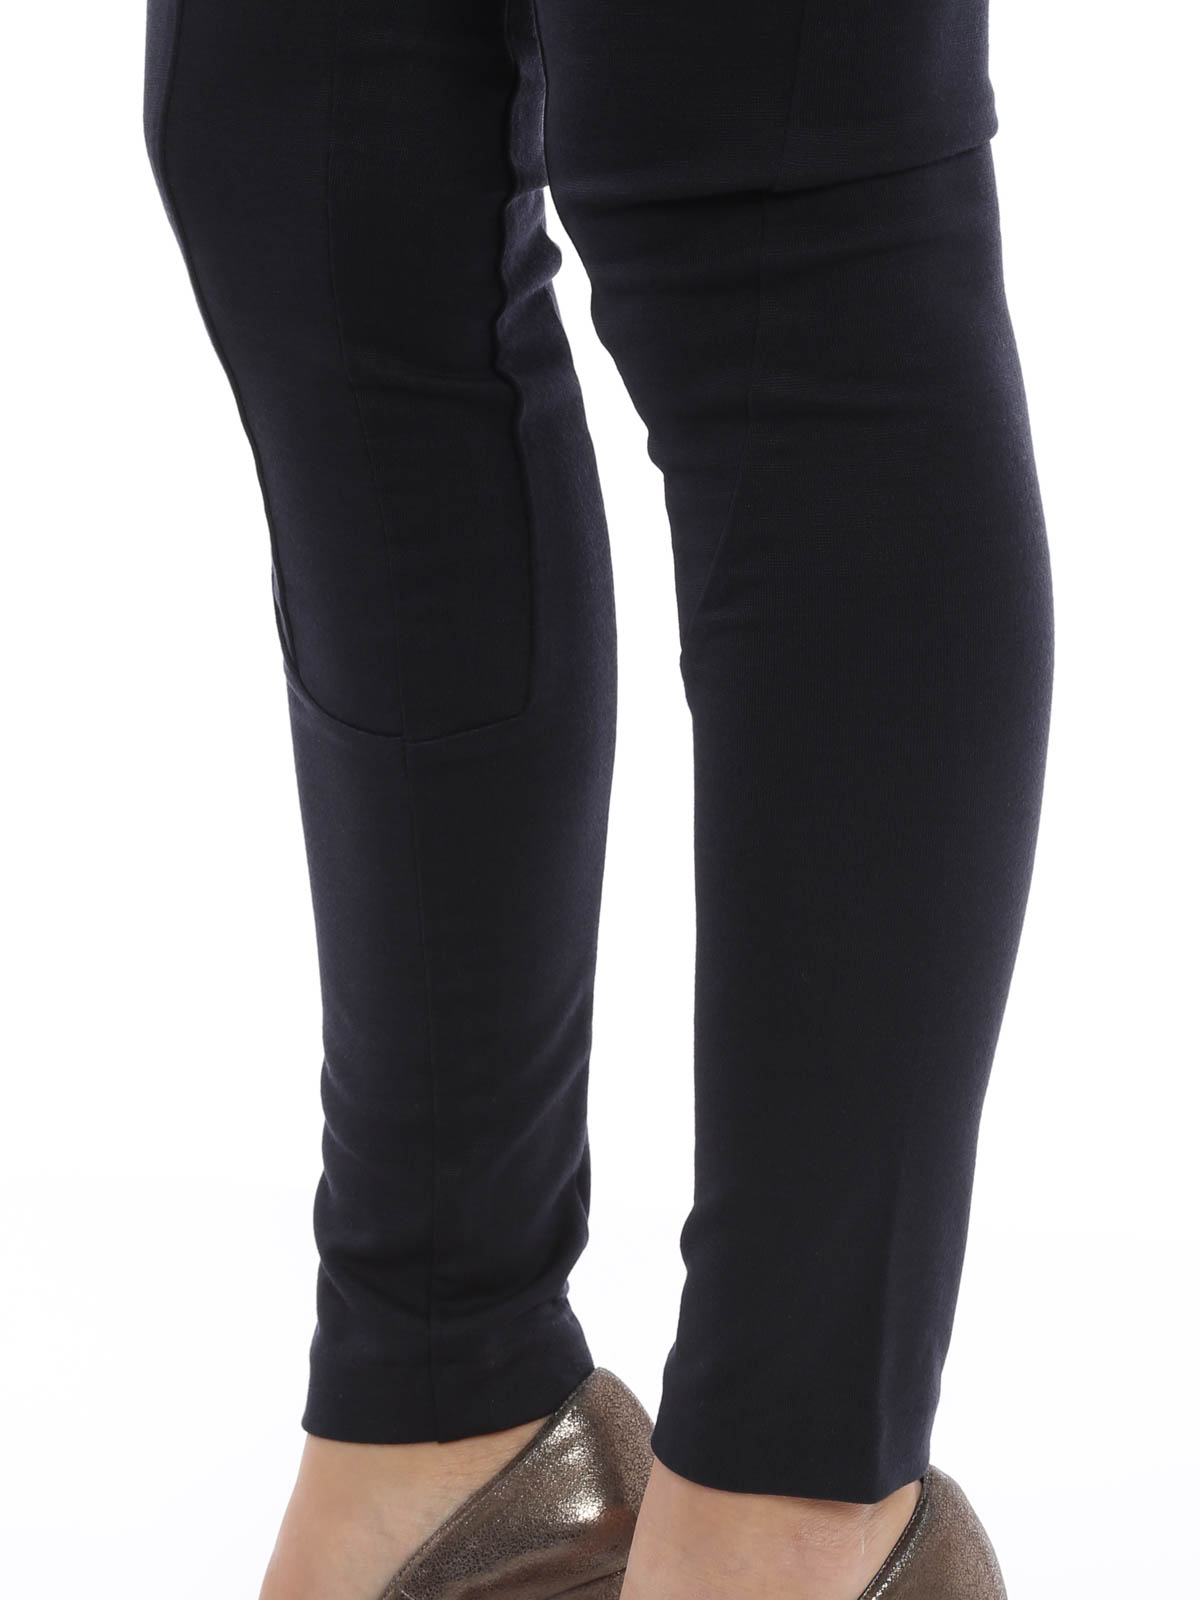 stretch fabric leggings by michael kors leggings ikrix. Black Bedroom Furniture Sets. Home Design Ideas